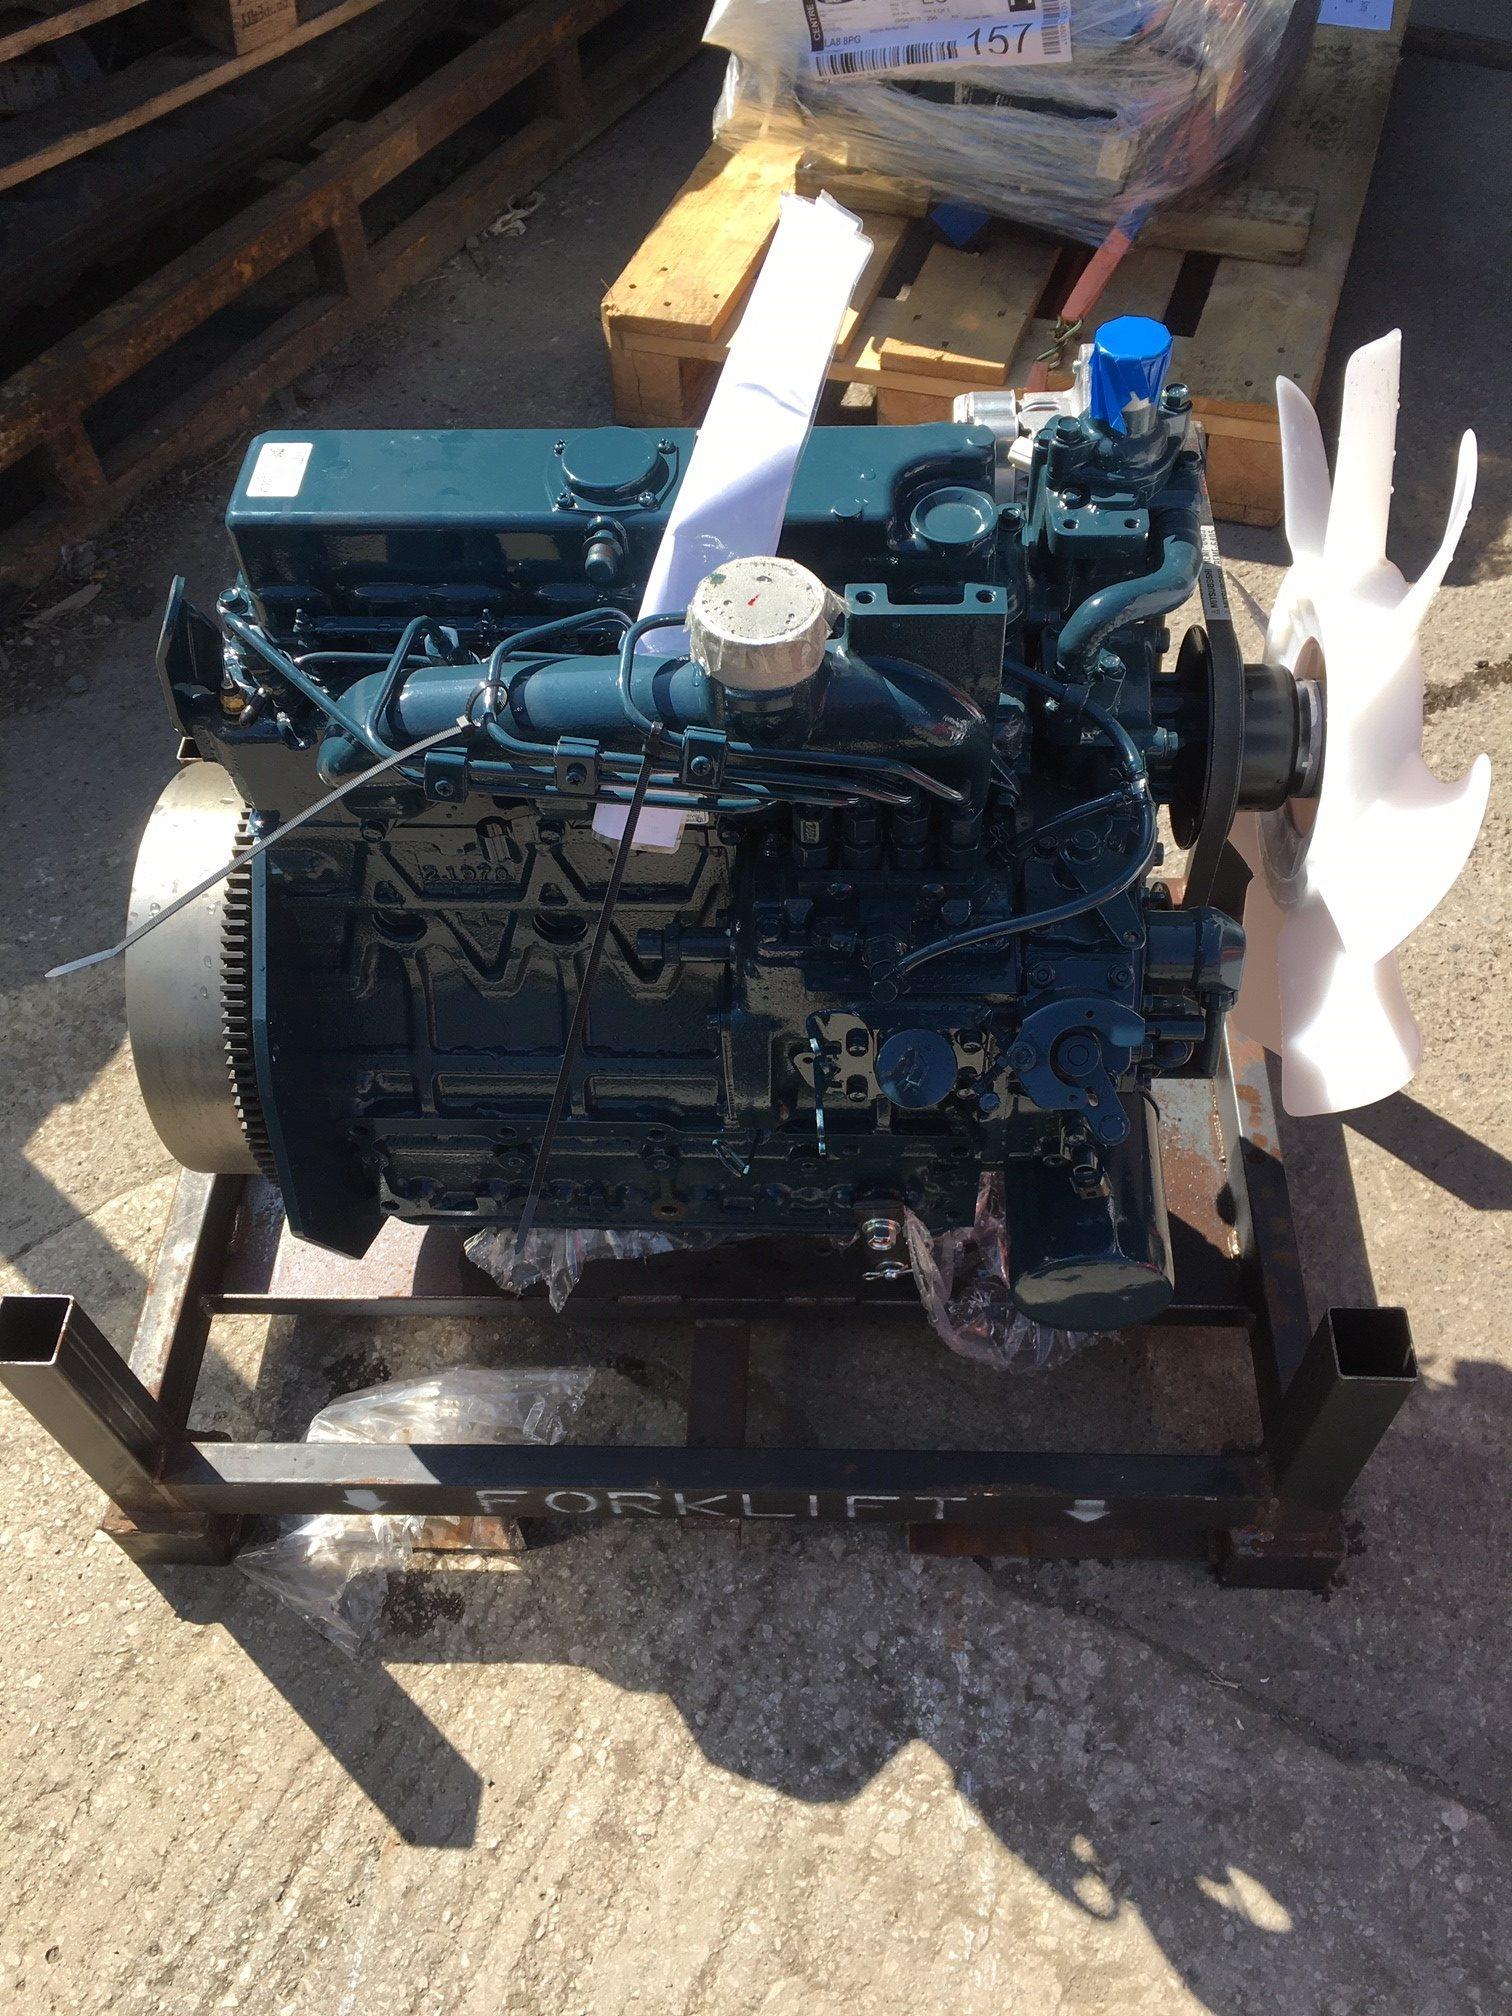 Kubota V2203m Ebh 2 Engine For Sale Kx161 3 U50 3 Mini Digger Spec